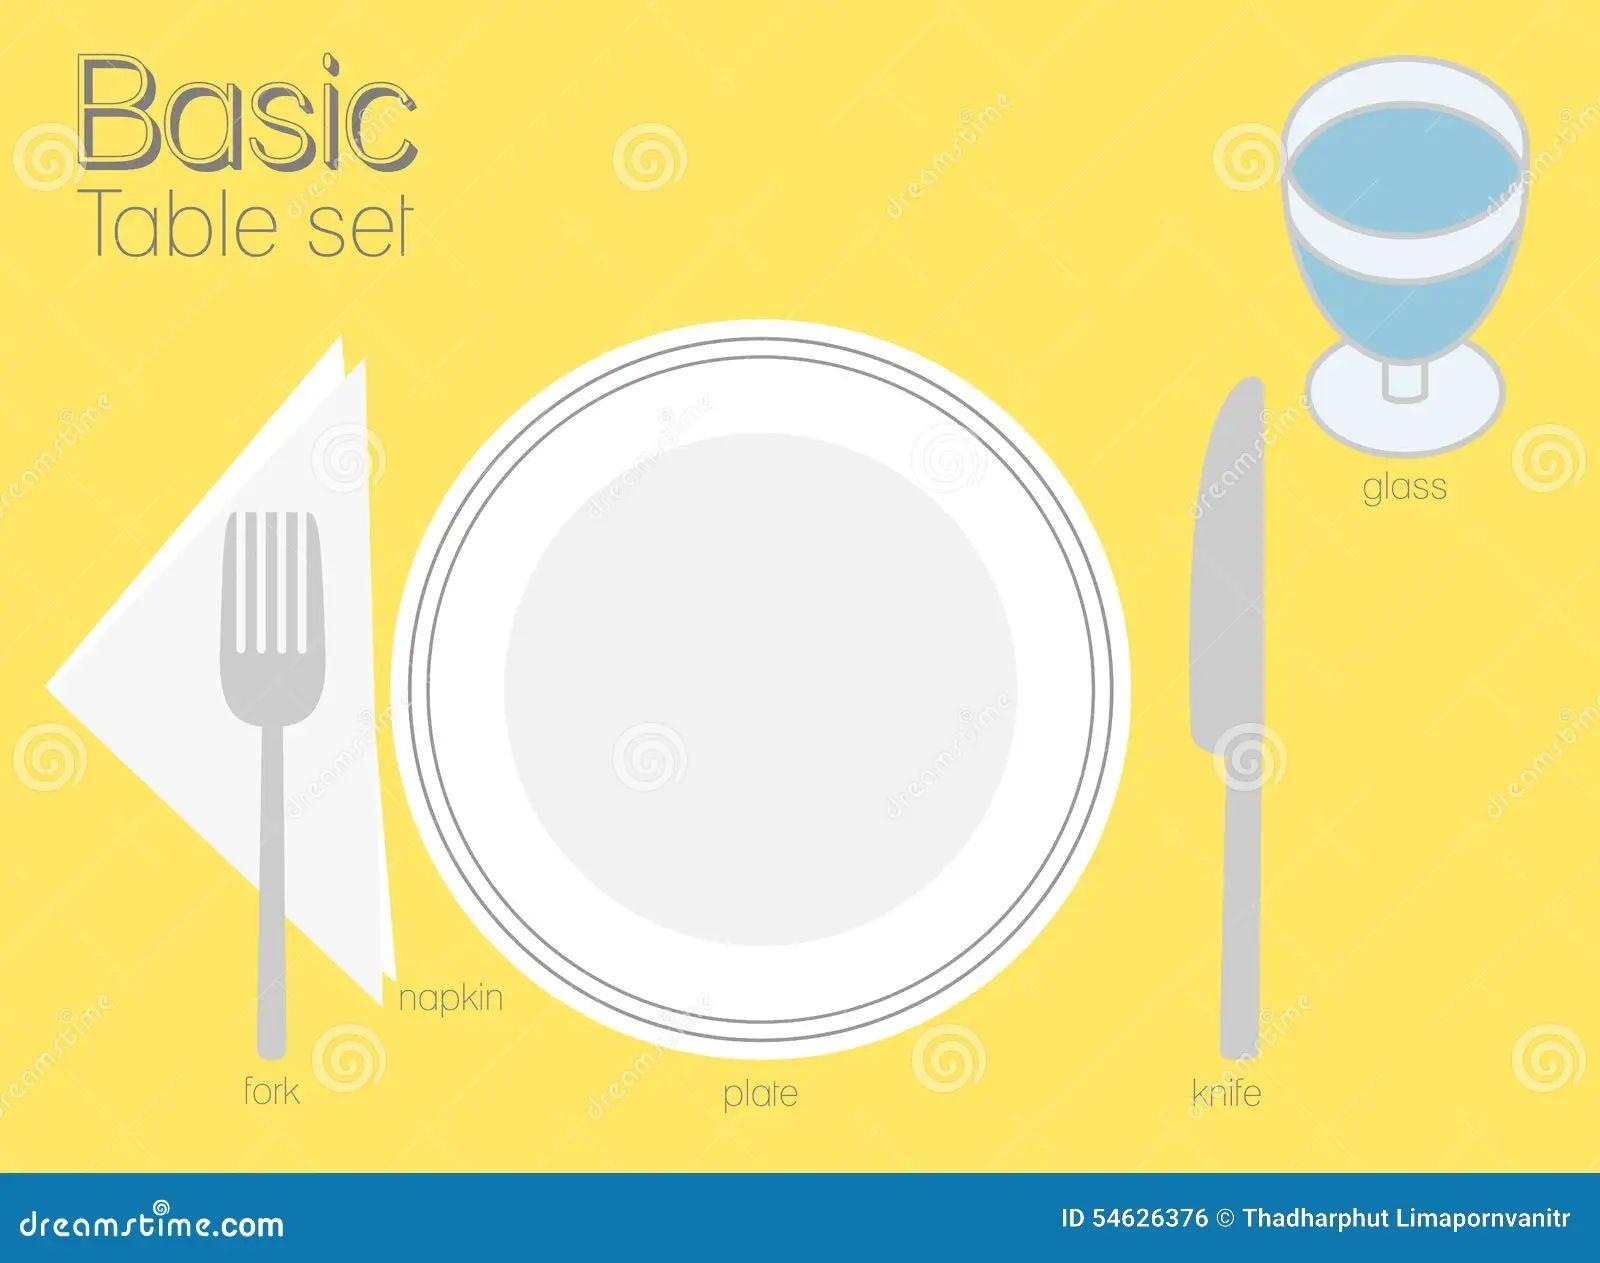 Simple dinner table setting - Simple Dinner Table Setting